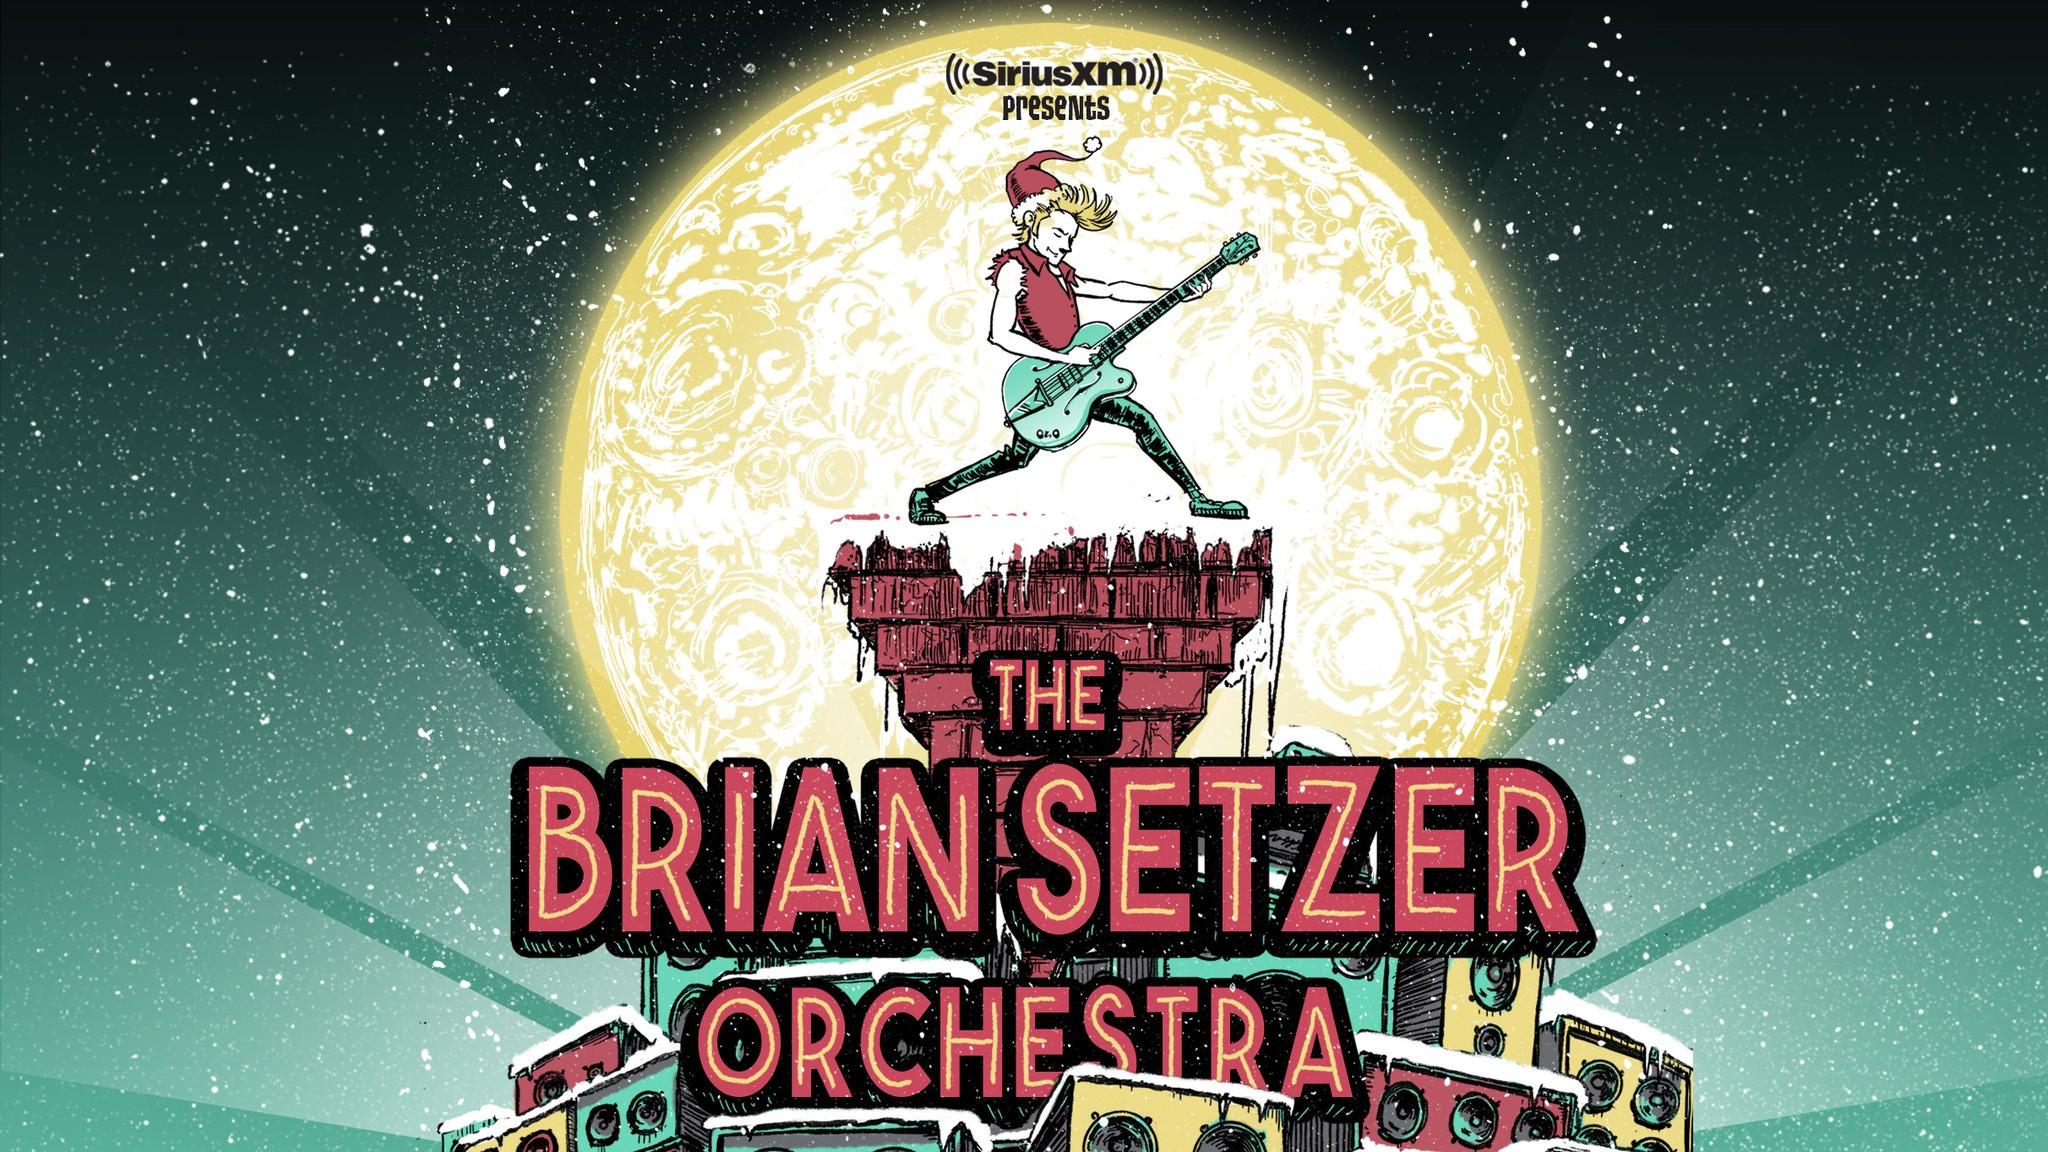 Siriusxm Christmas Music.Siriusxm Presents The Brian Setzer Orchestra S 16th Annual